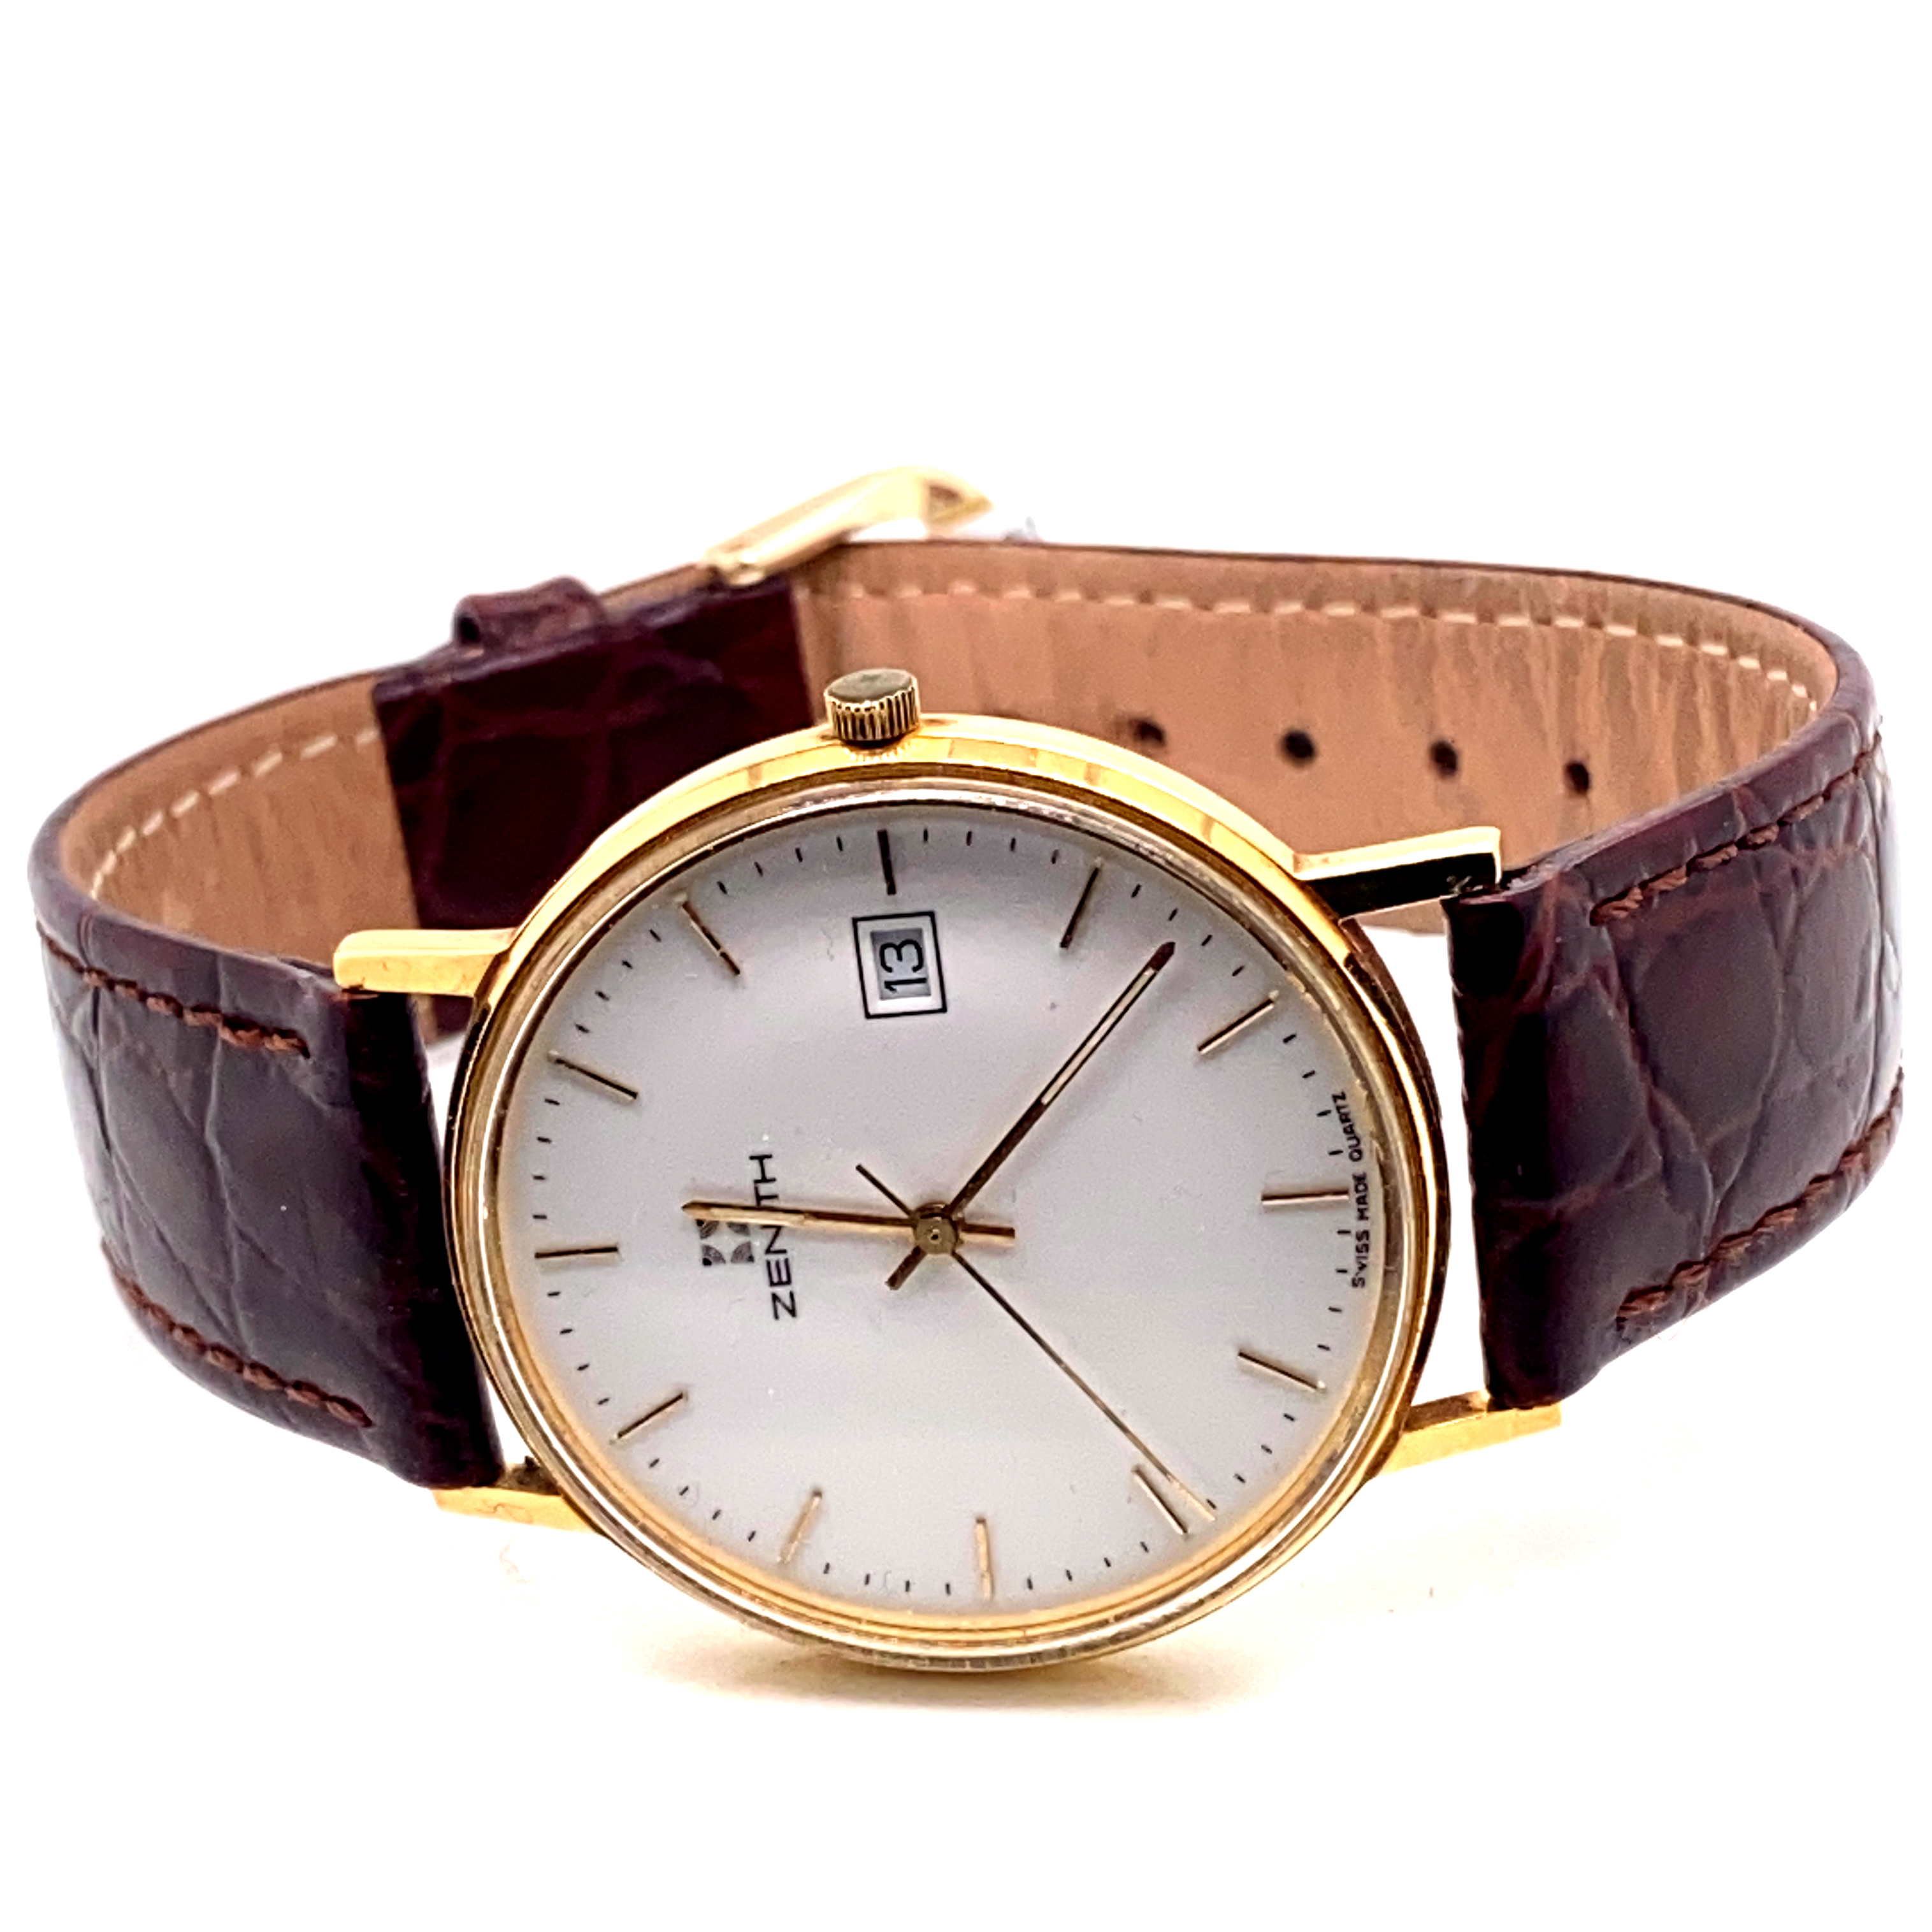 Lot 14 - Zenith 18ct quartz dress watch